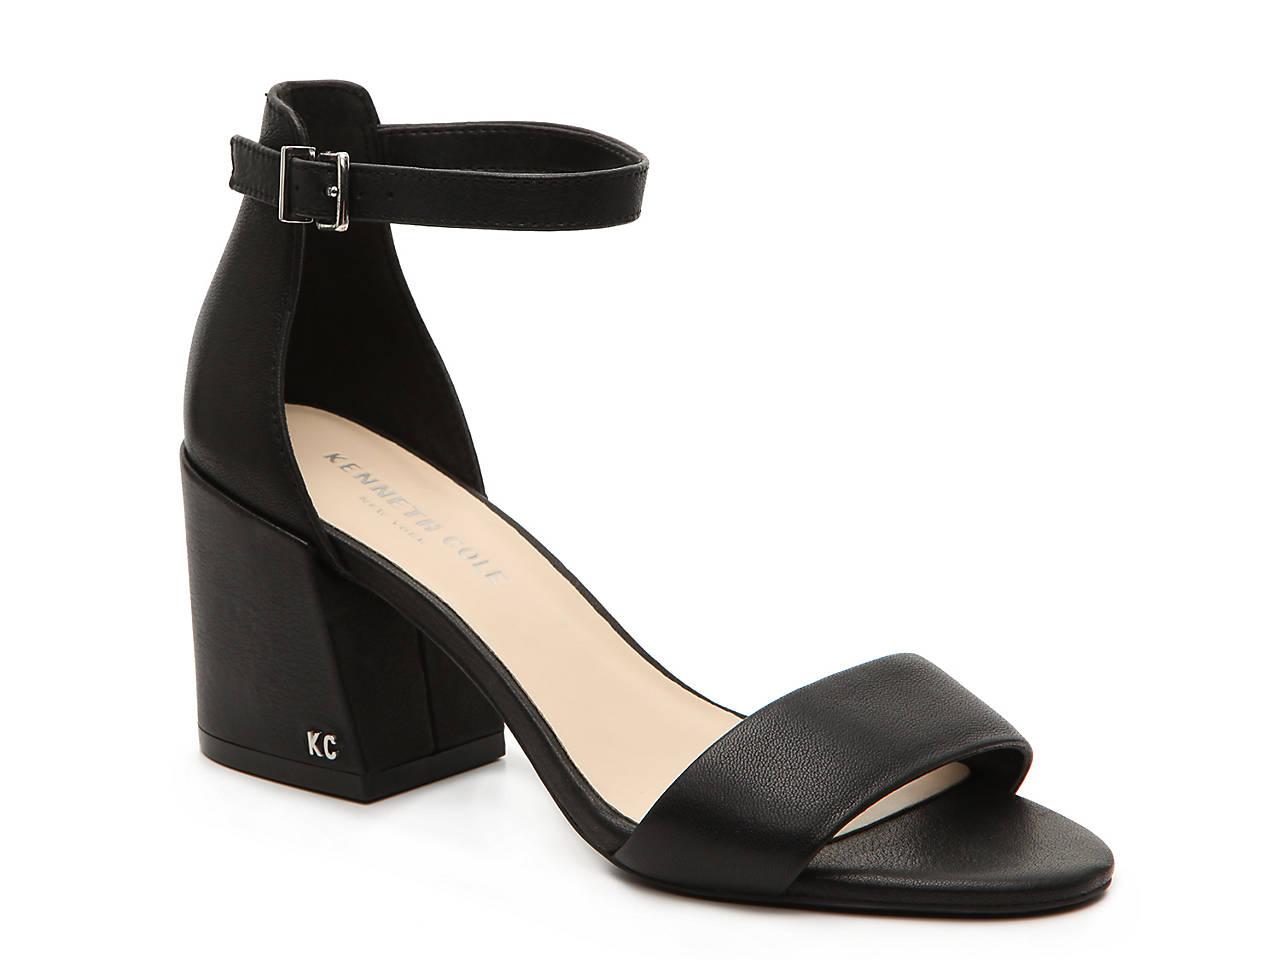 abb235c6689 Kenneth Cole New York Hannon Sandal Women s Shoes